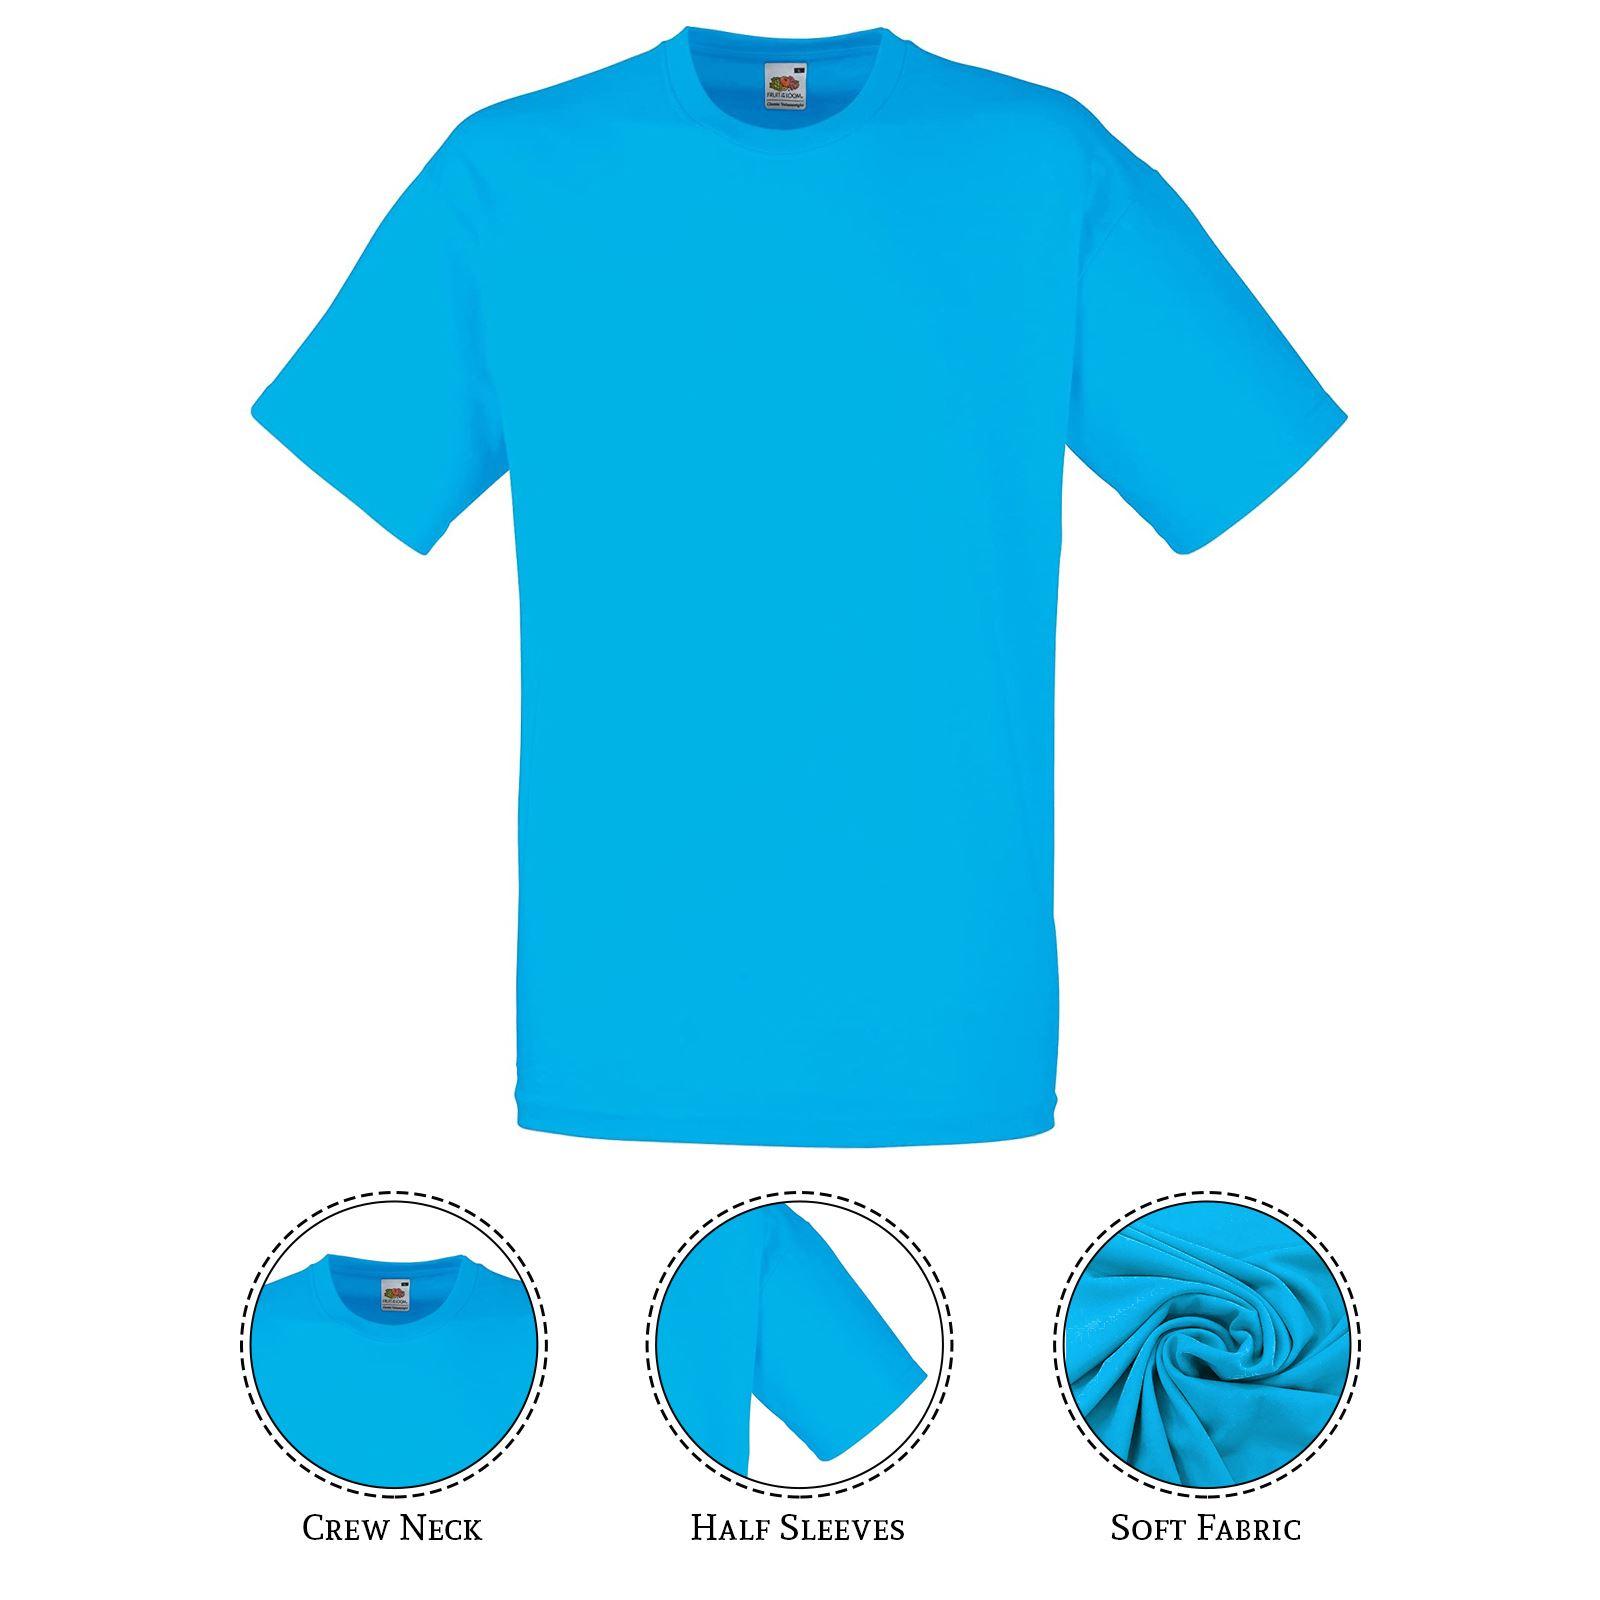 thumbnail 43 - Men-s-Fruit-Of-The-Loom-T-Shirt-Original-100-Cotton-Casual-Plain-Top-Tee